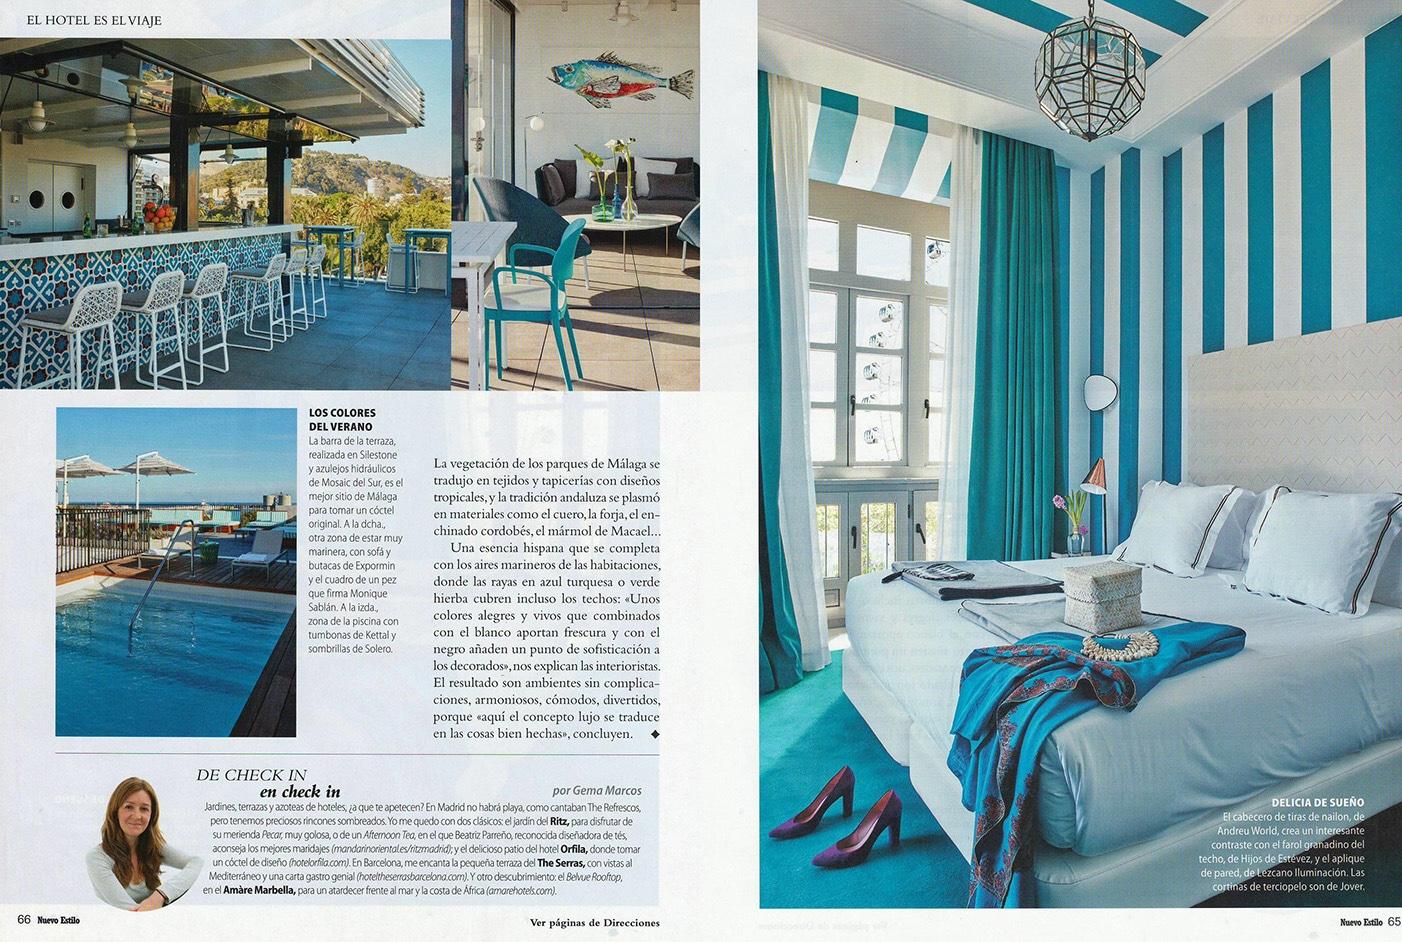 nuevo estilo-melian-randolph-junio-2016-valeria-hotel-roommate-C